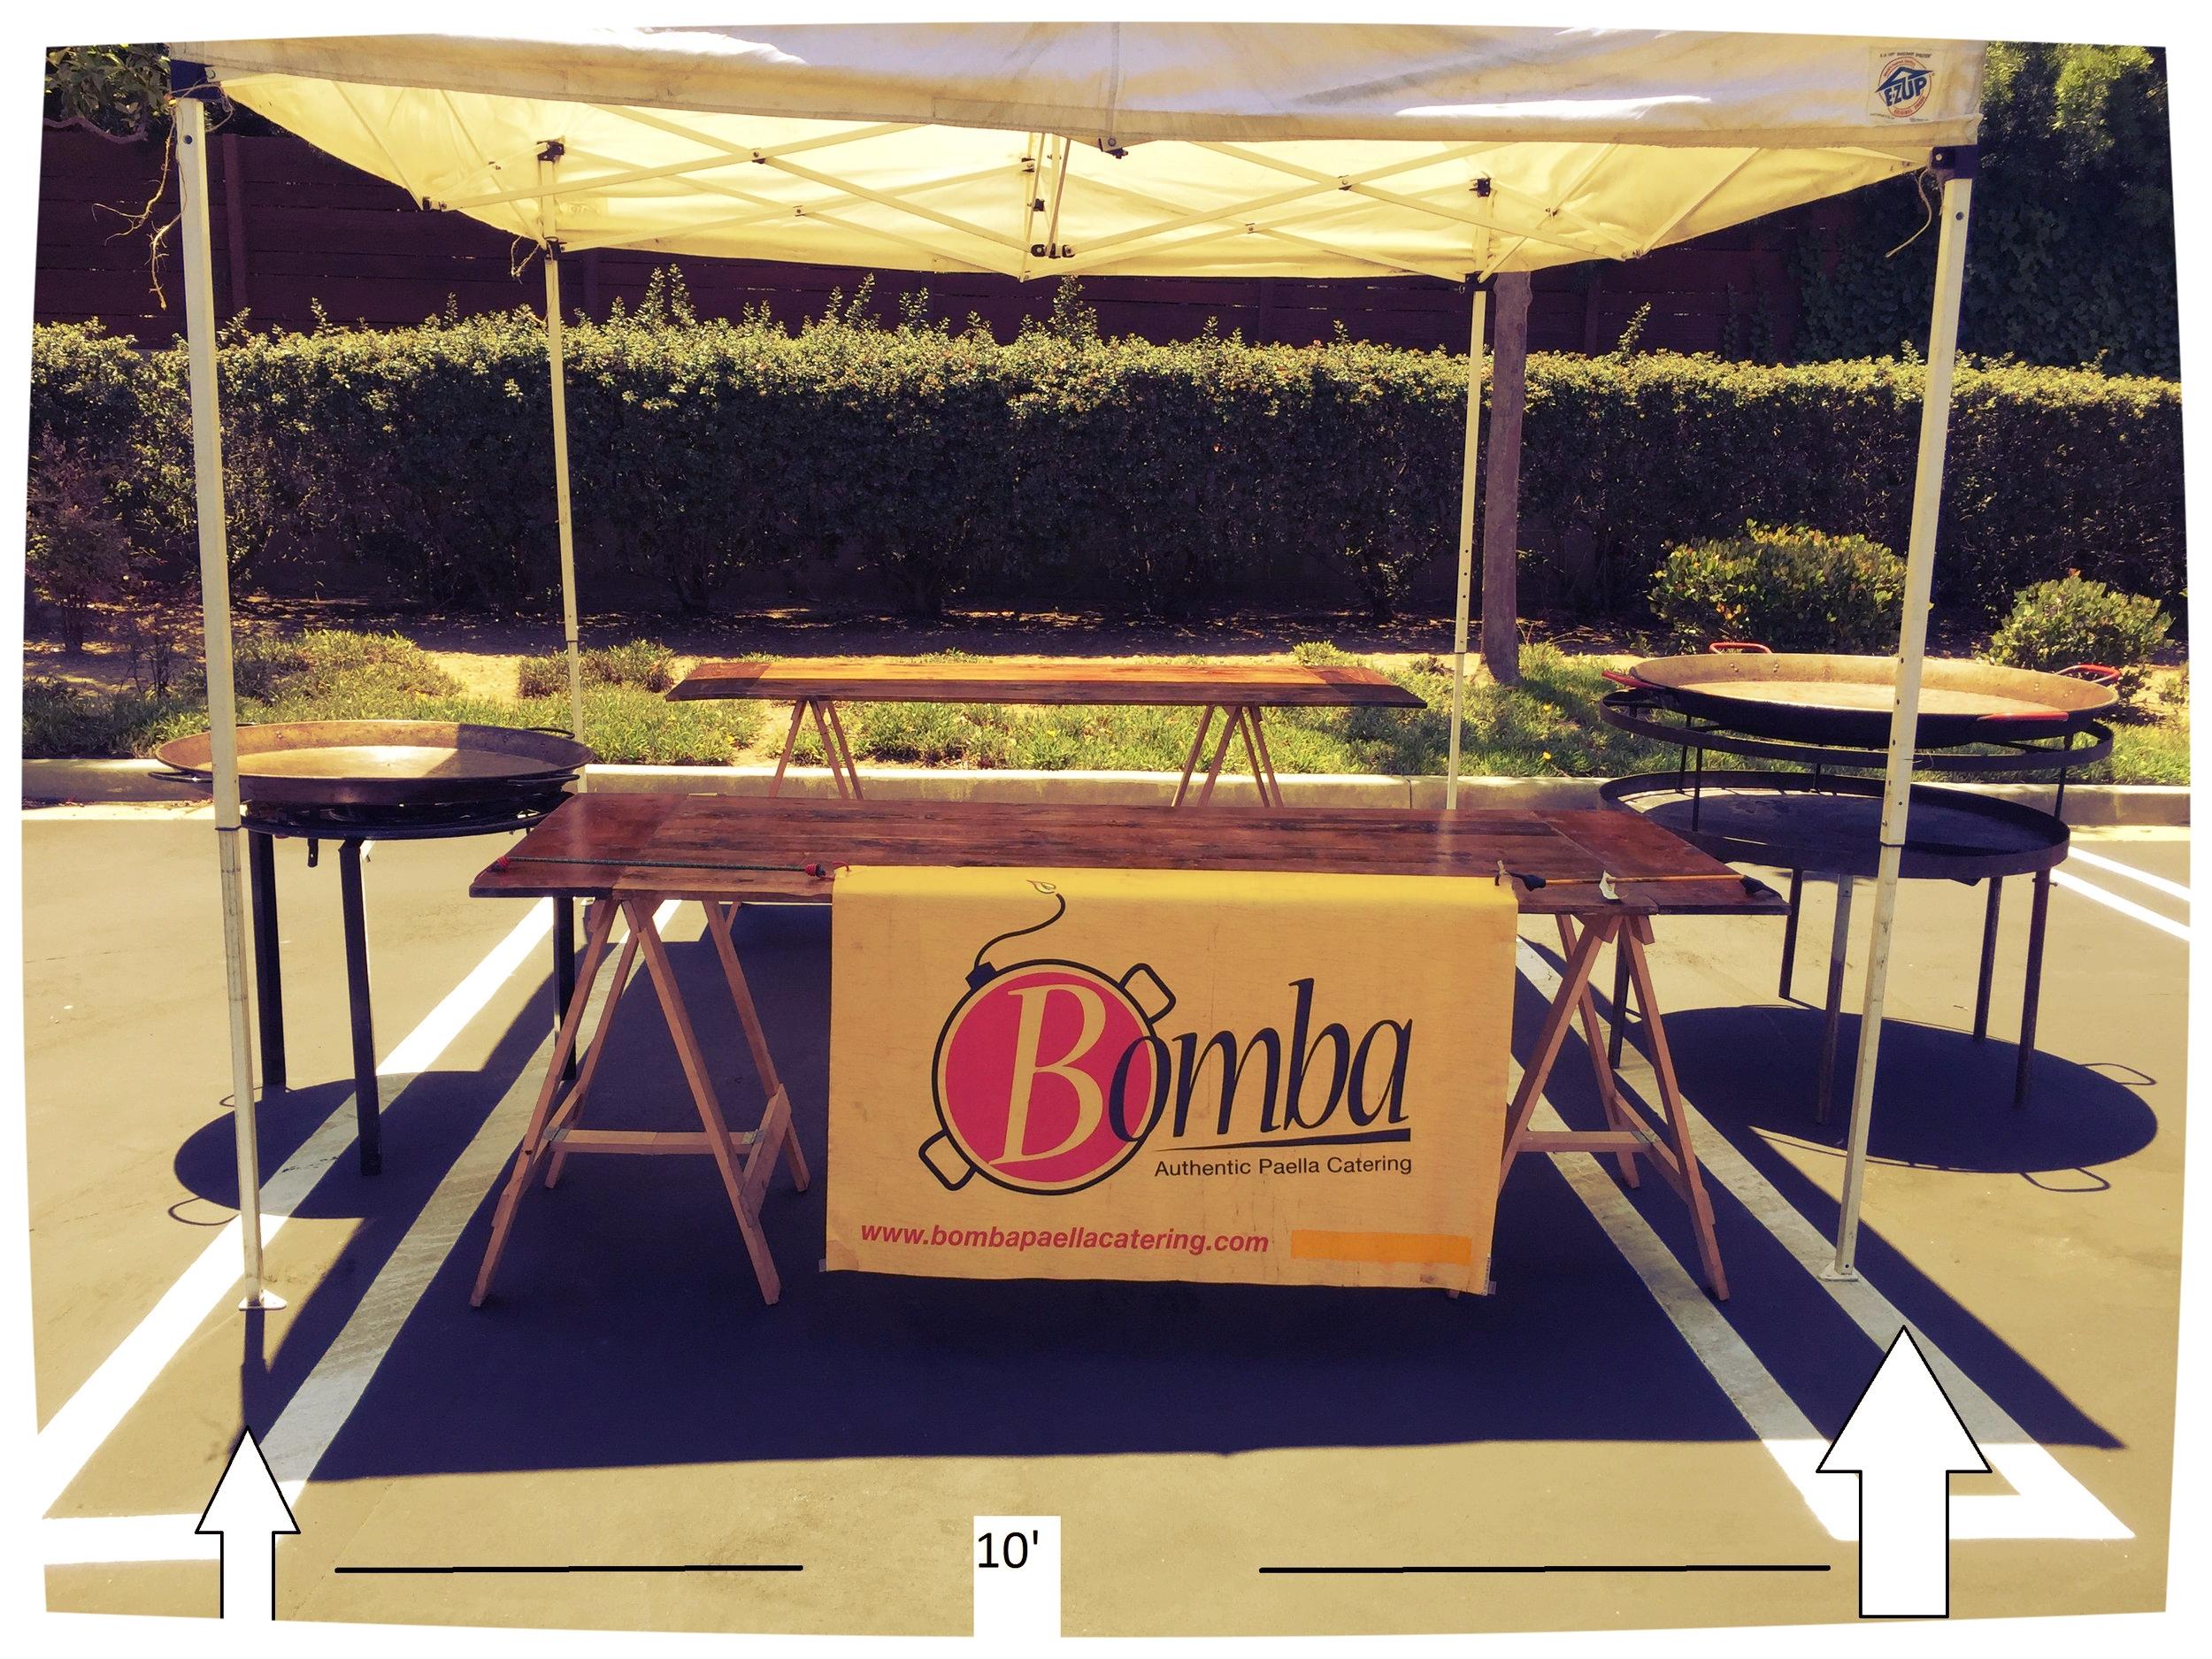 bomba-paella-catering -layout-12.jpg